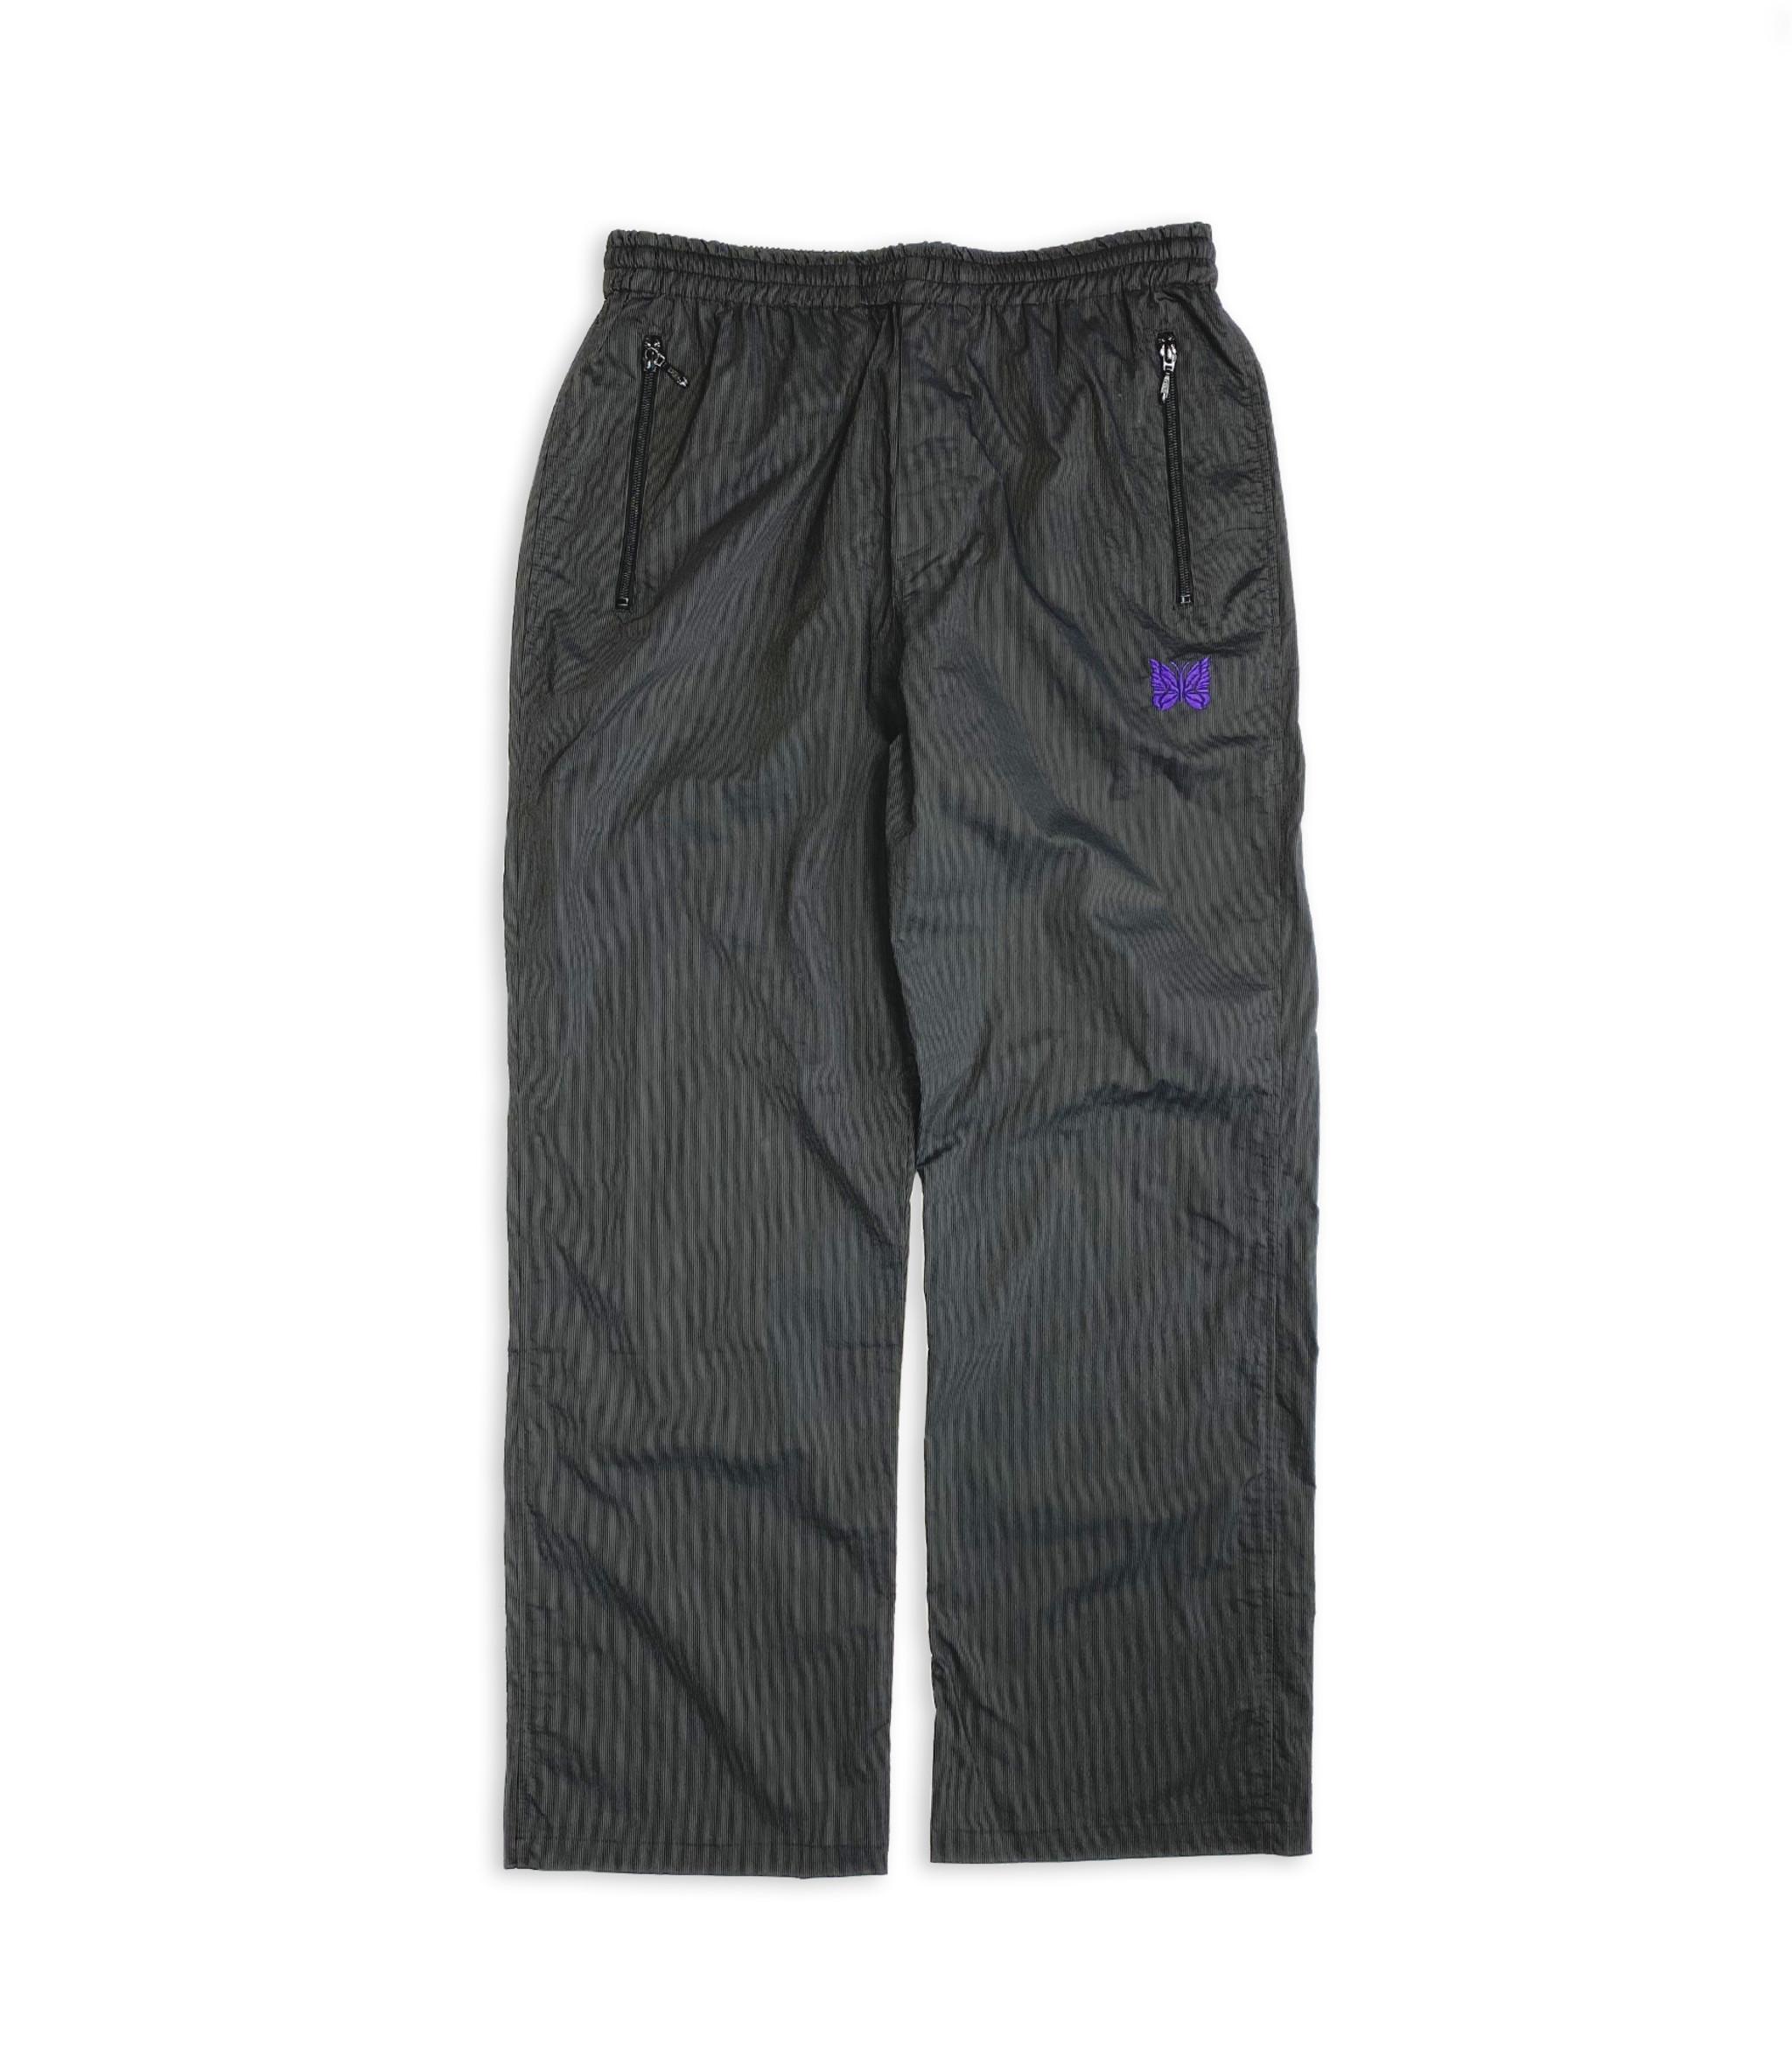 Needles Jog Pant - Nylon Iridescent Stripe - Charcoal